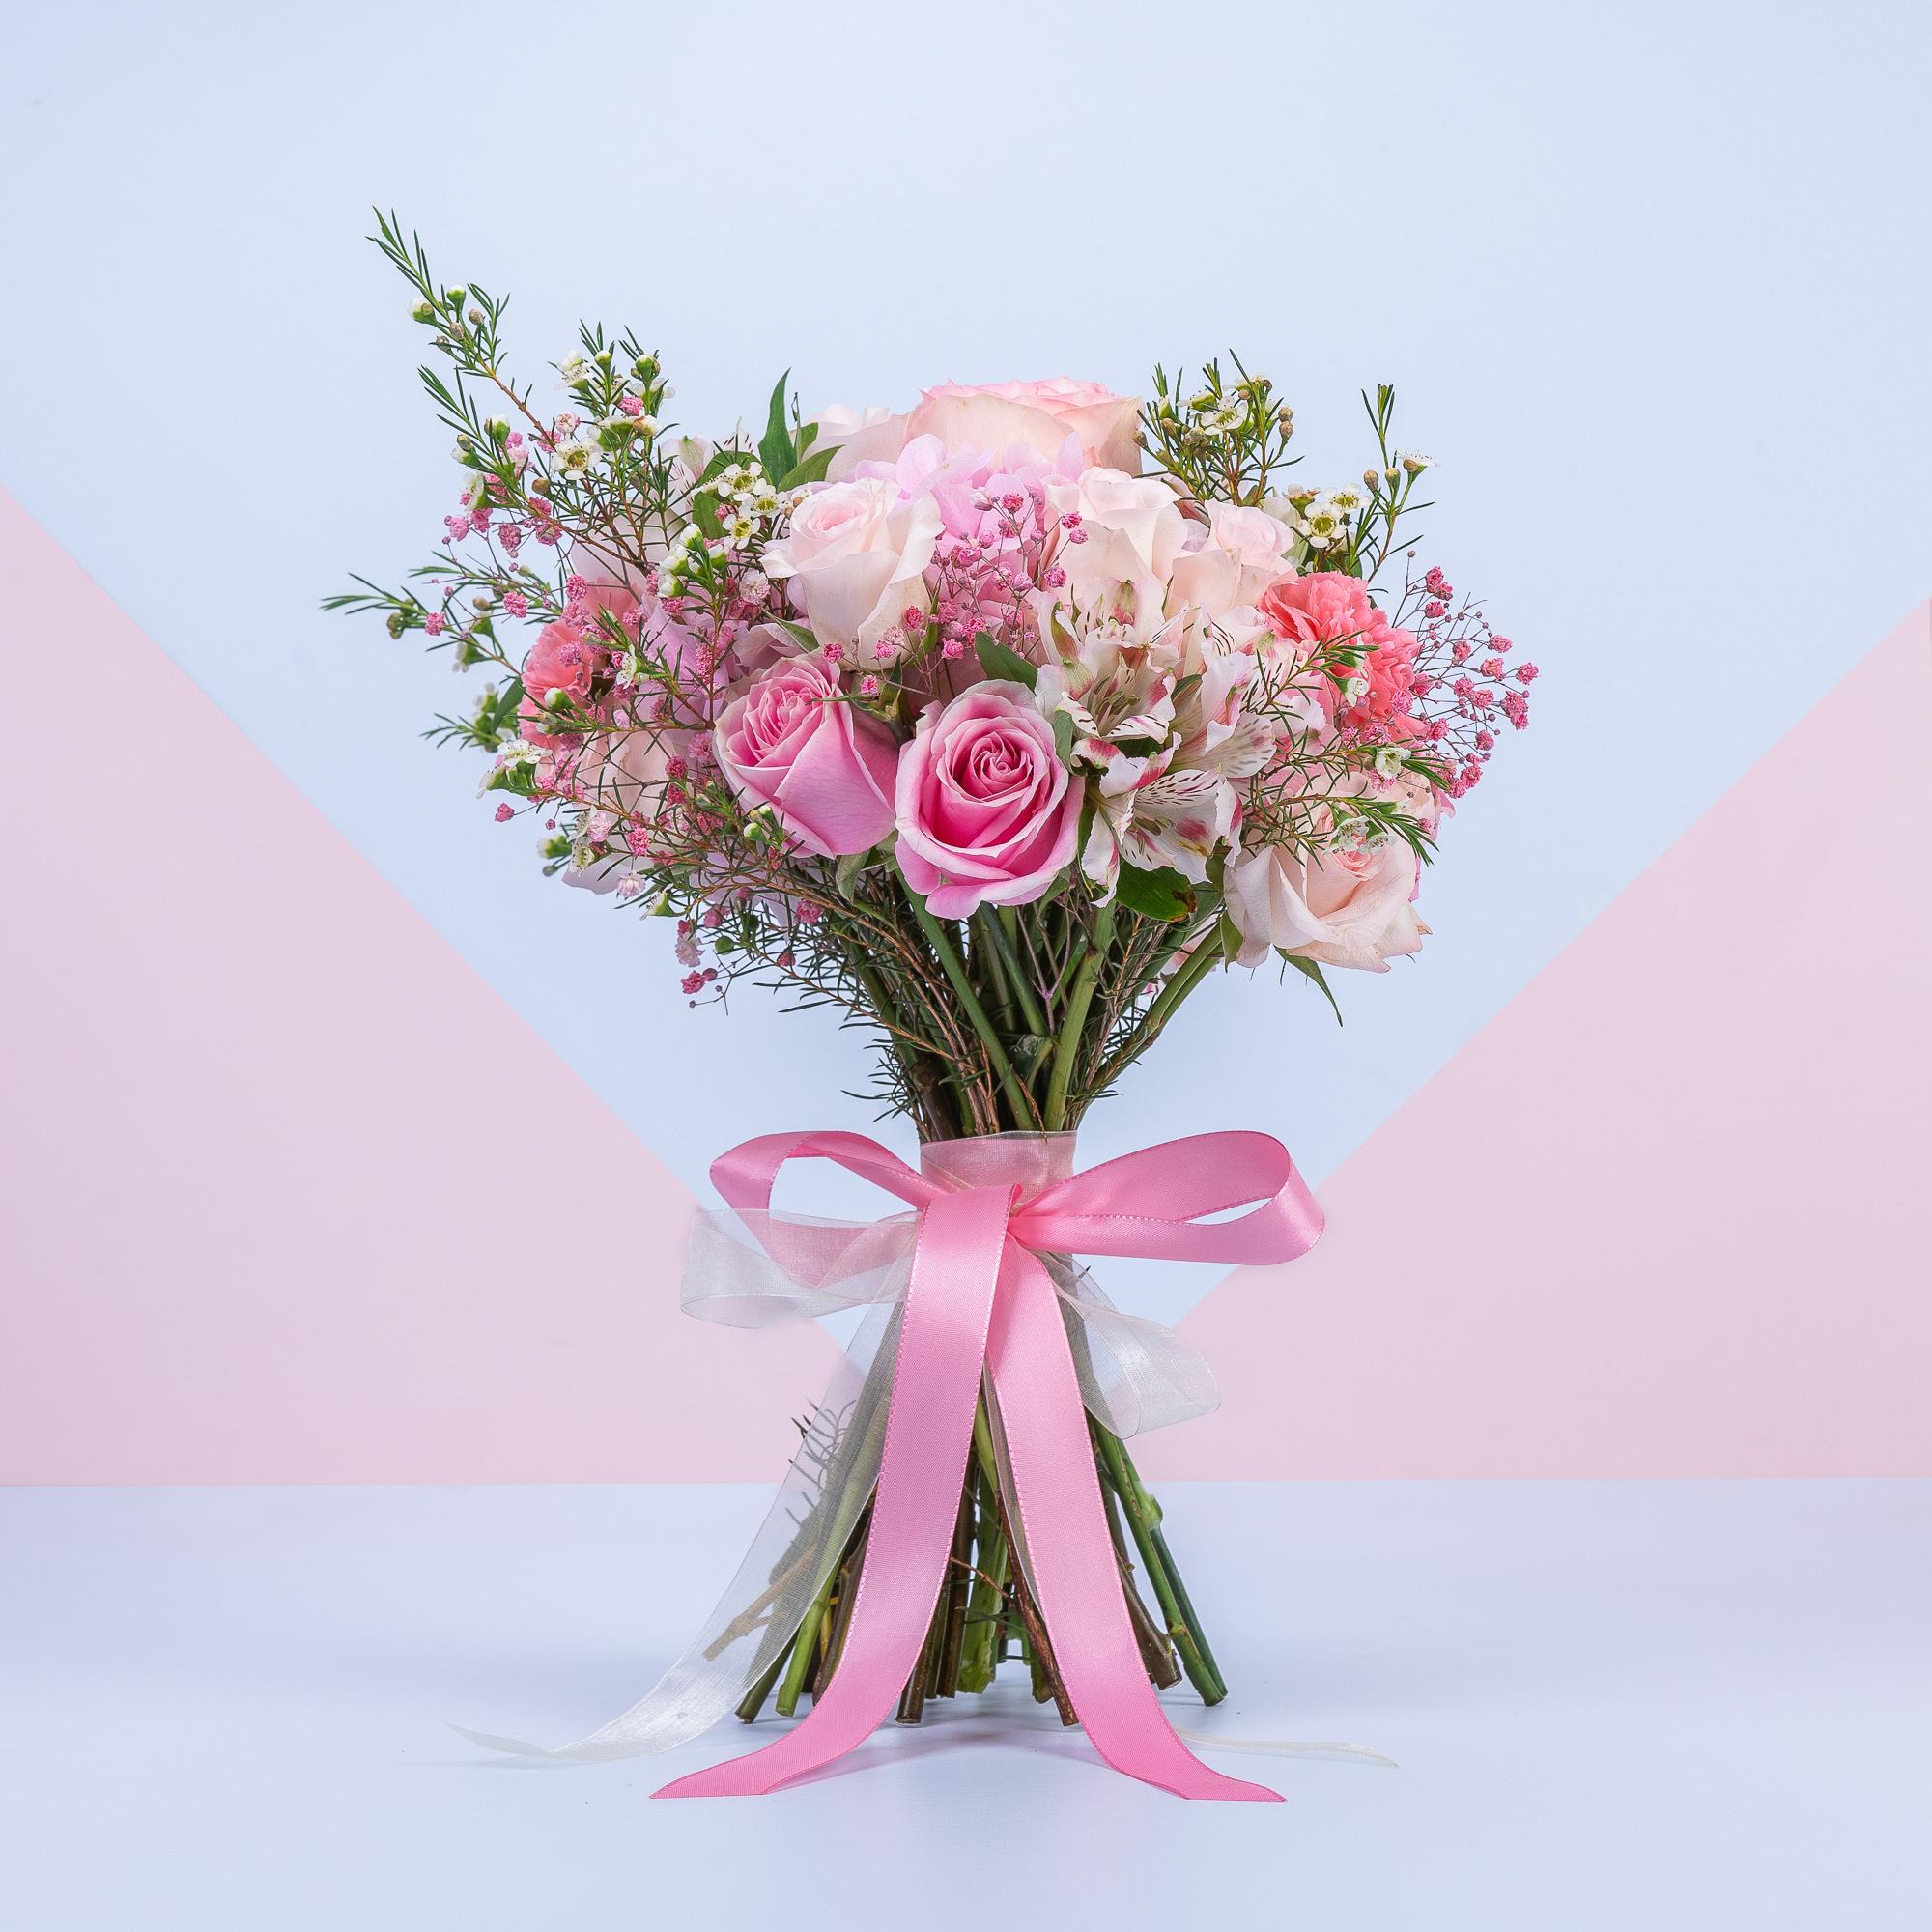 Seeta's Bouquet I